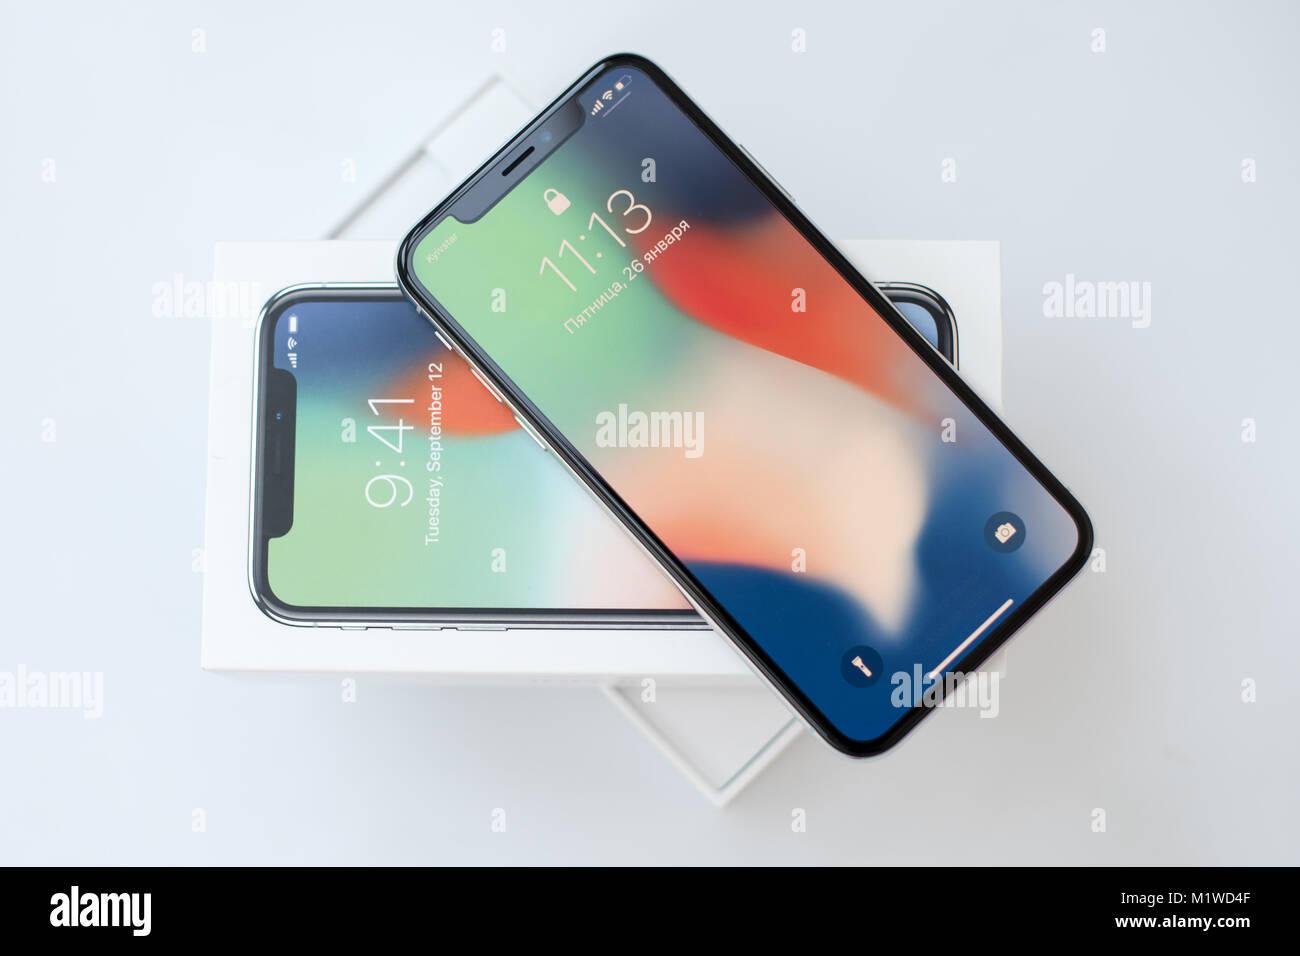 iphone x in kiev